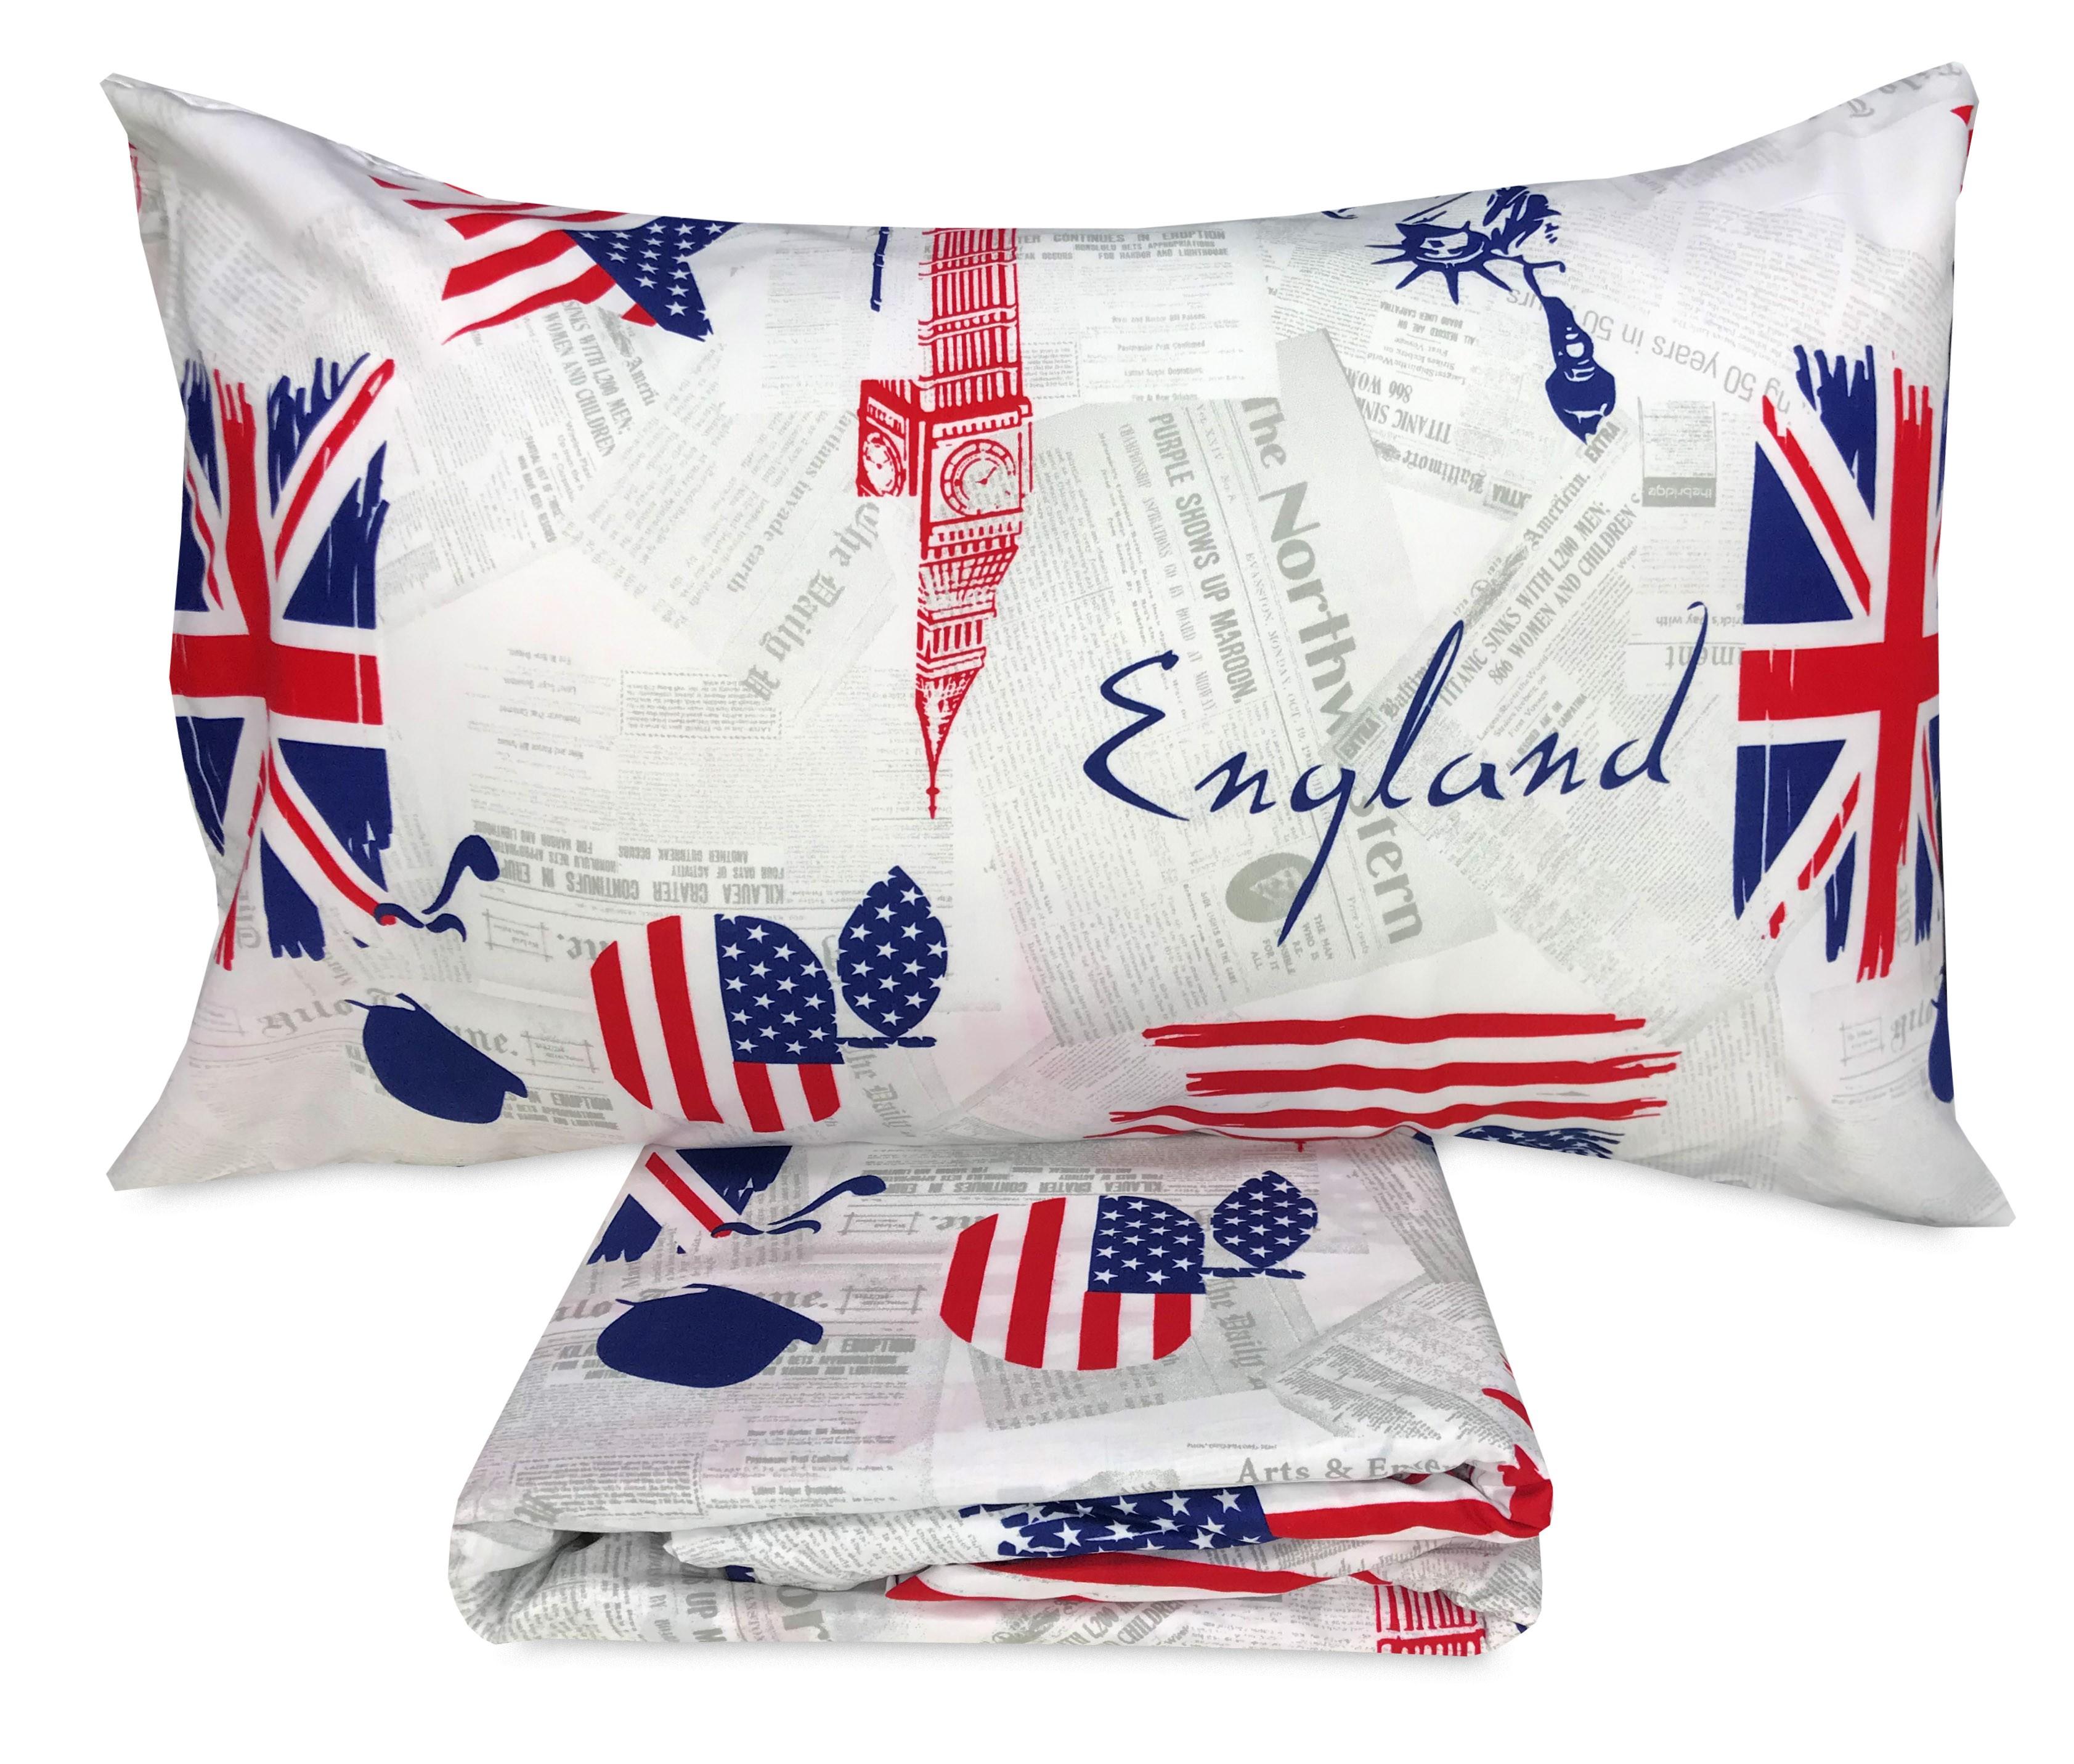 Copripiumino Singolo Bandiera Inglese.Copripiumino Bandiera Inglese E Americana Apple And Sherlock